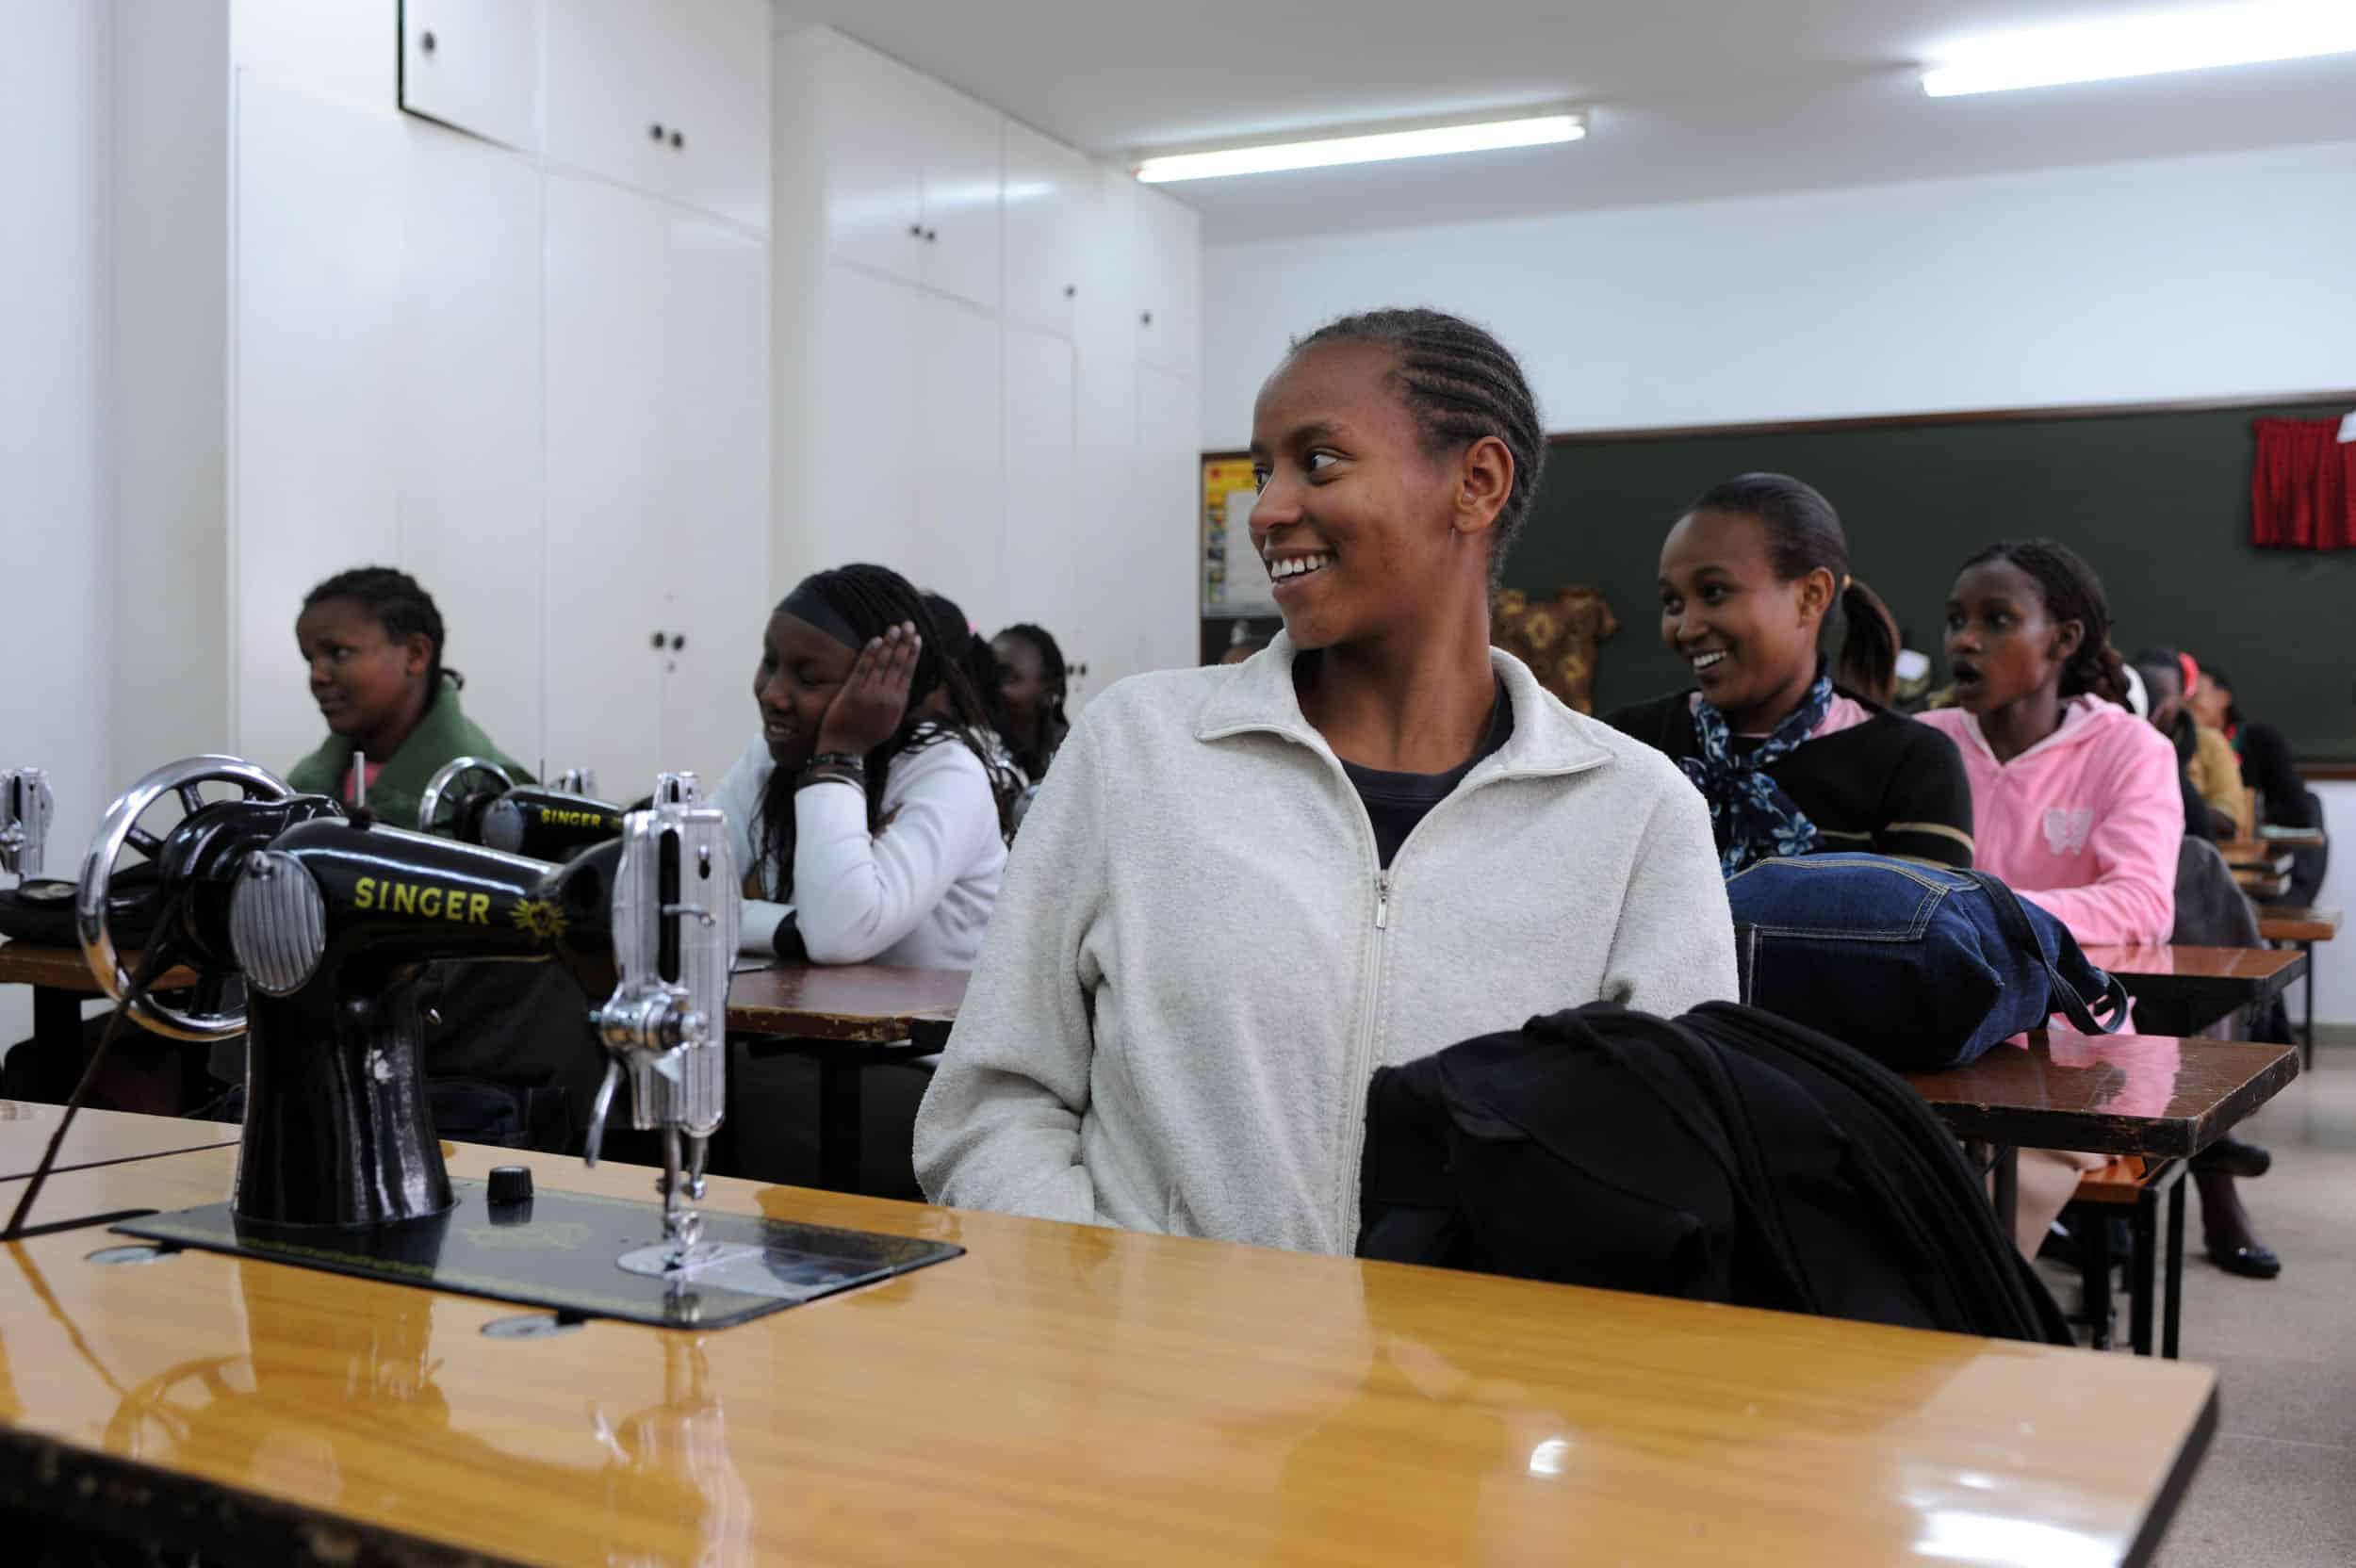 Curso de alfabetización, tareas domésticas e higiene en Loyangalani